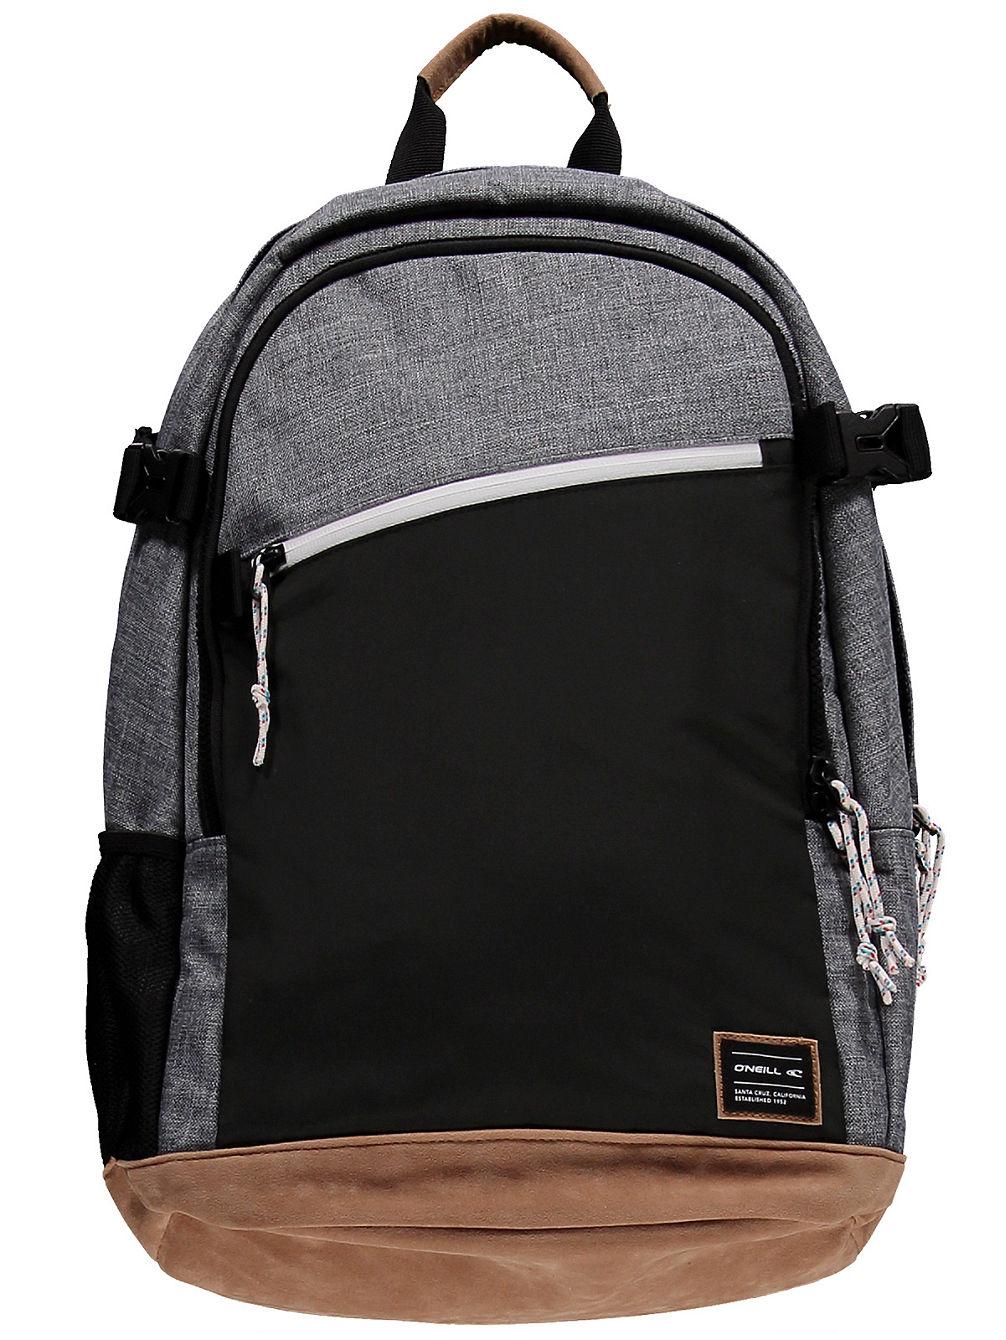 buy o 39 neill bm easy rider backpack online at blue. Black Bedroom Furniture Sets. Home Design Ideas